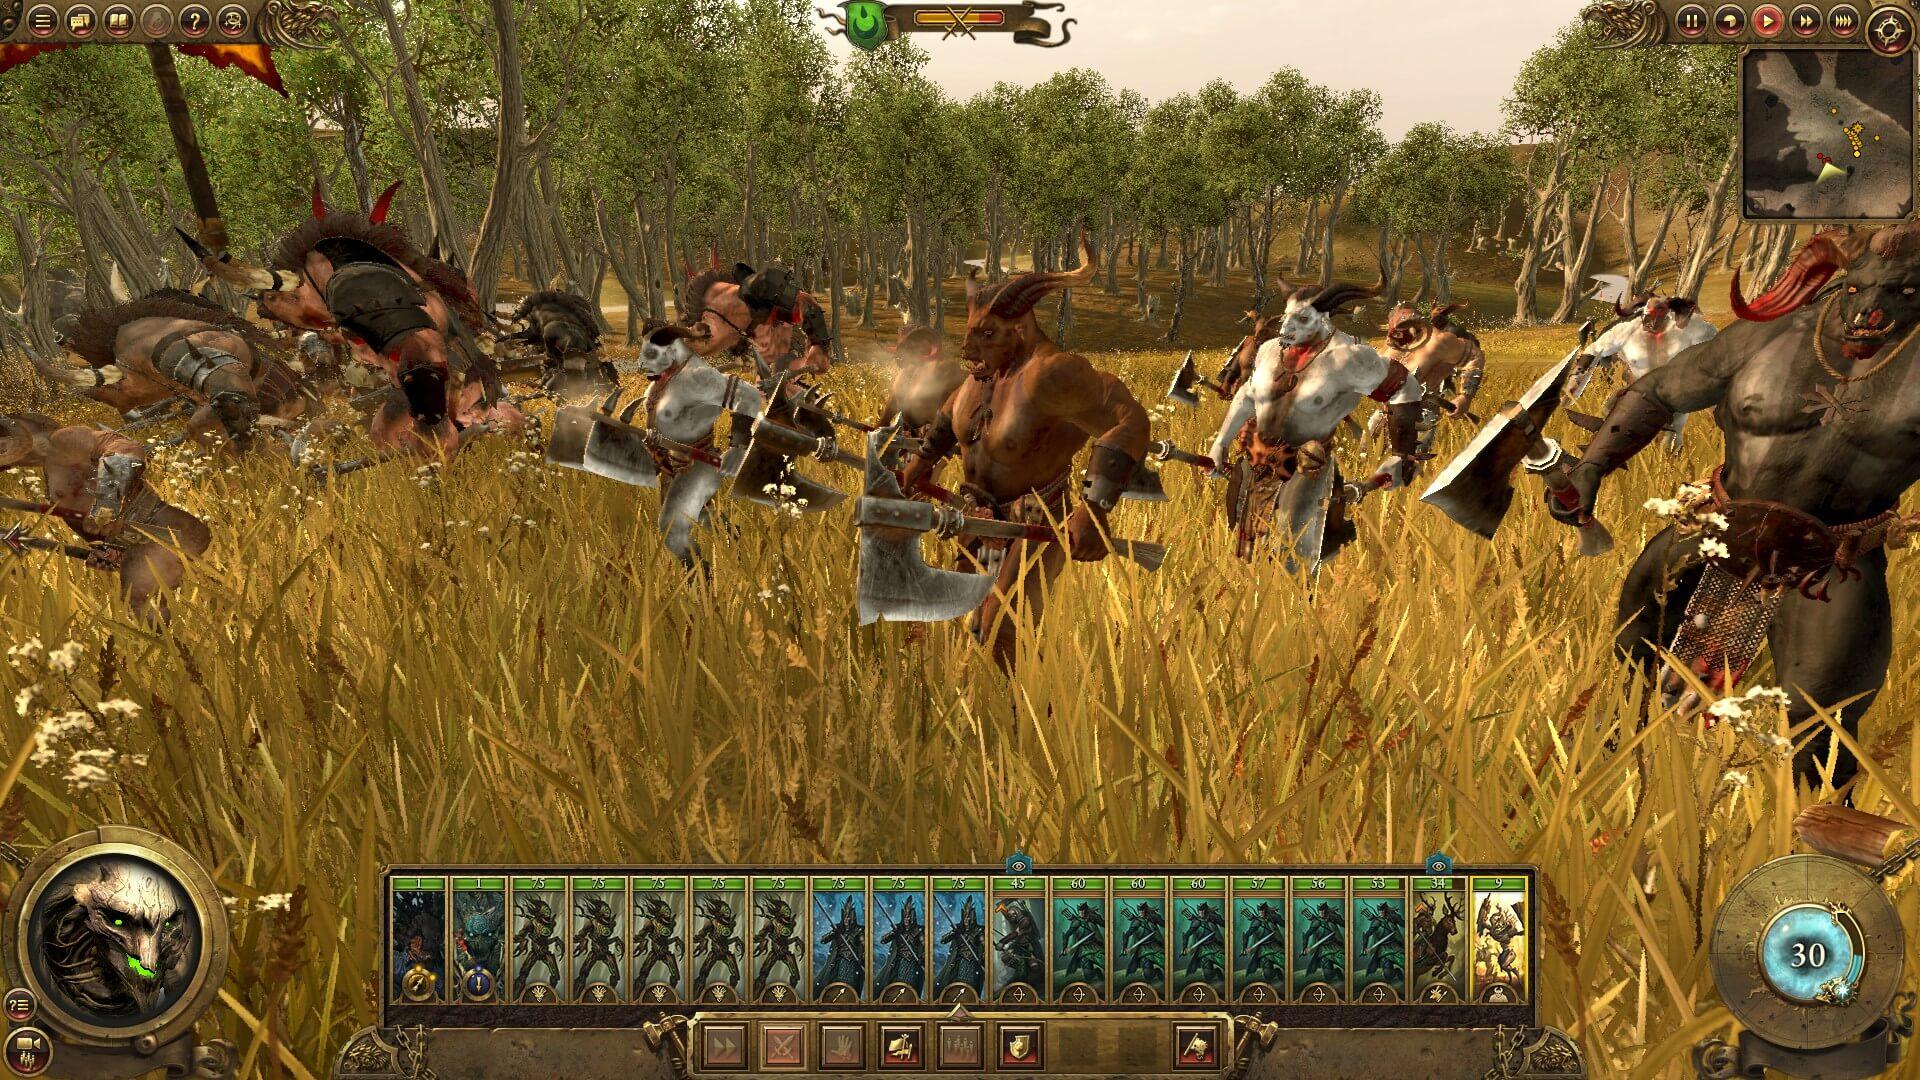 Best Total War Warhammer 2 Mods Pc Gamer - #Summer